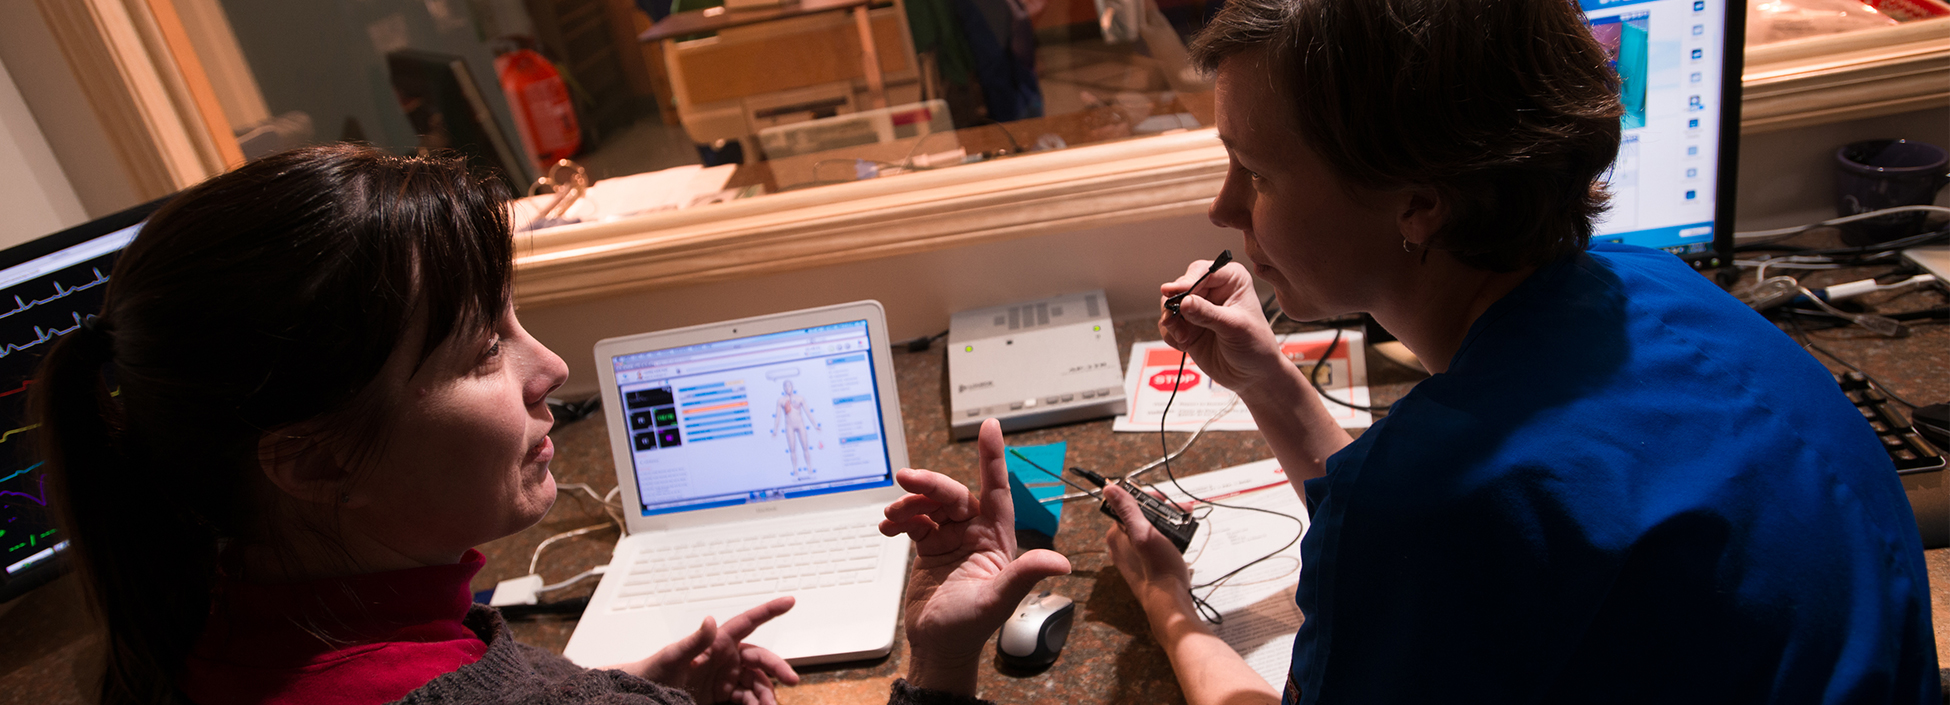 Our nursing Simulation Laboratory located on the Wiliston campus